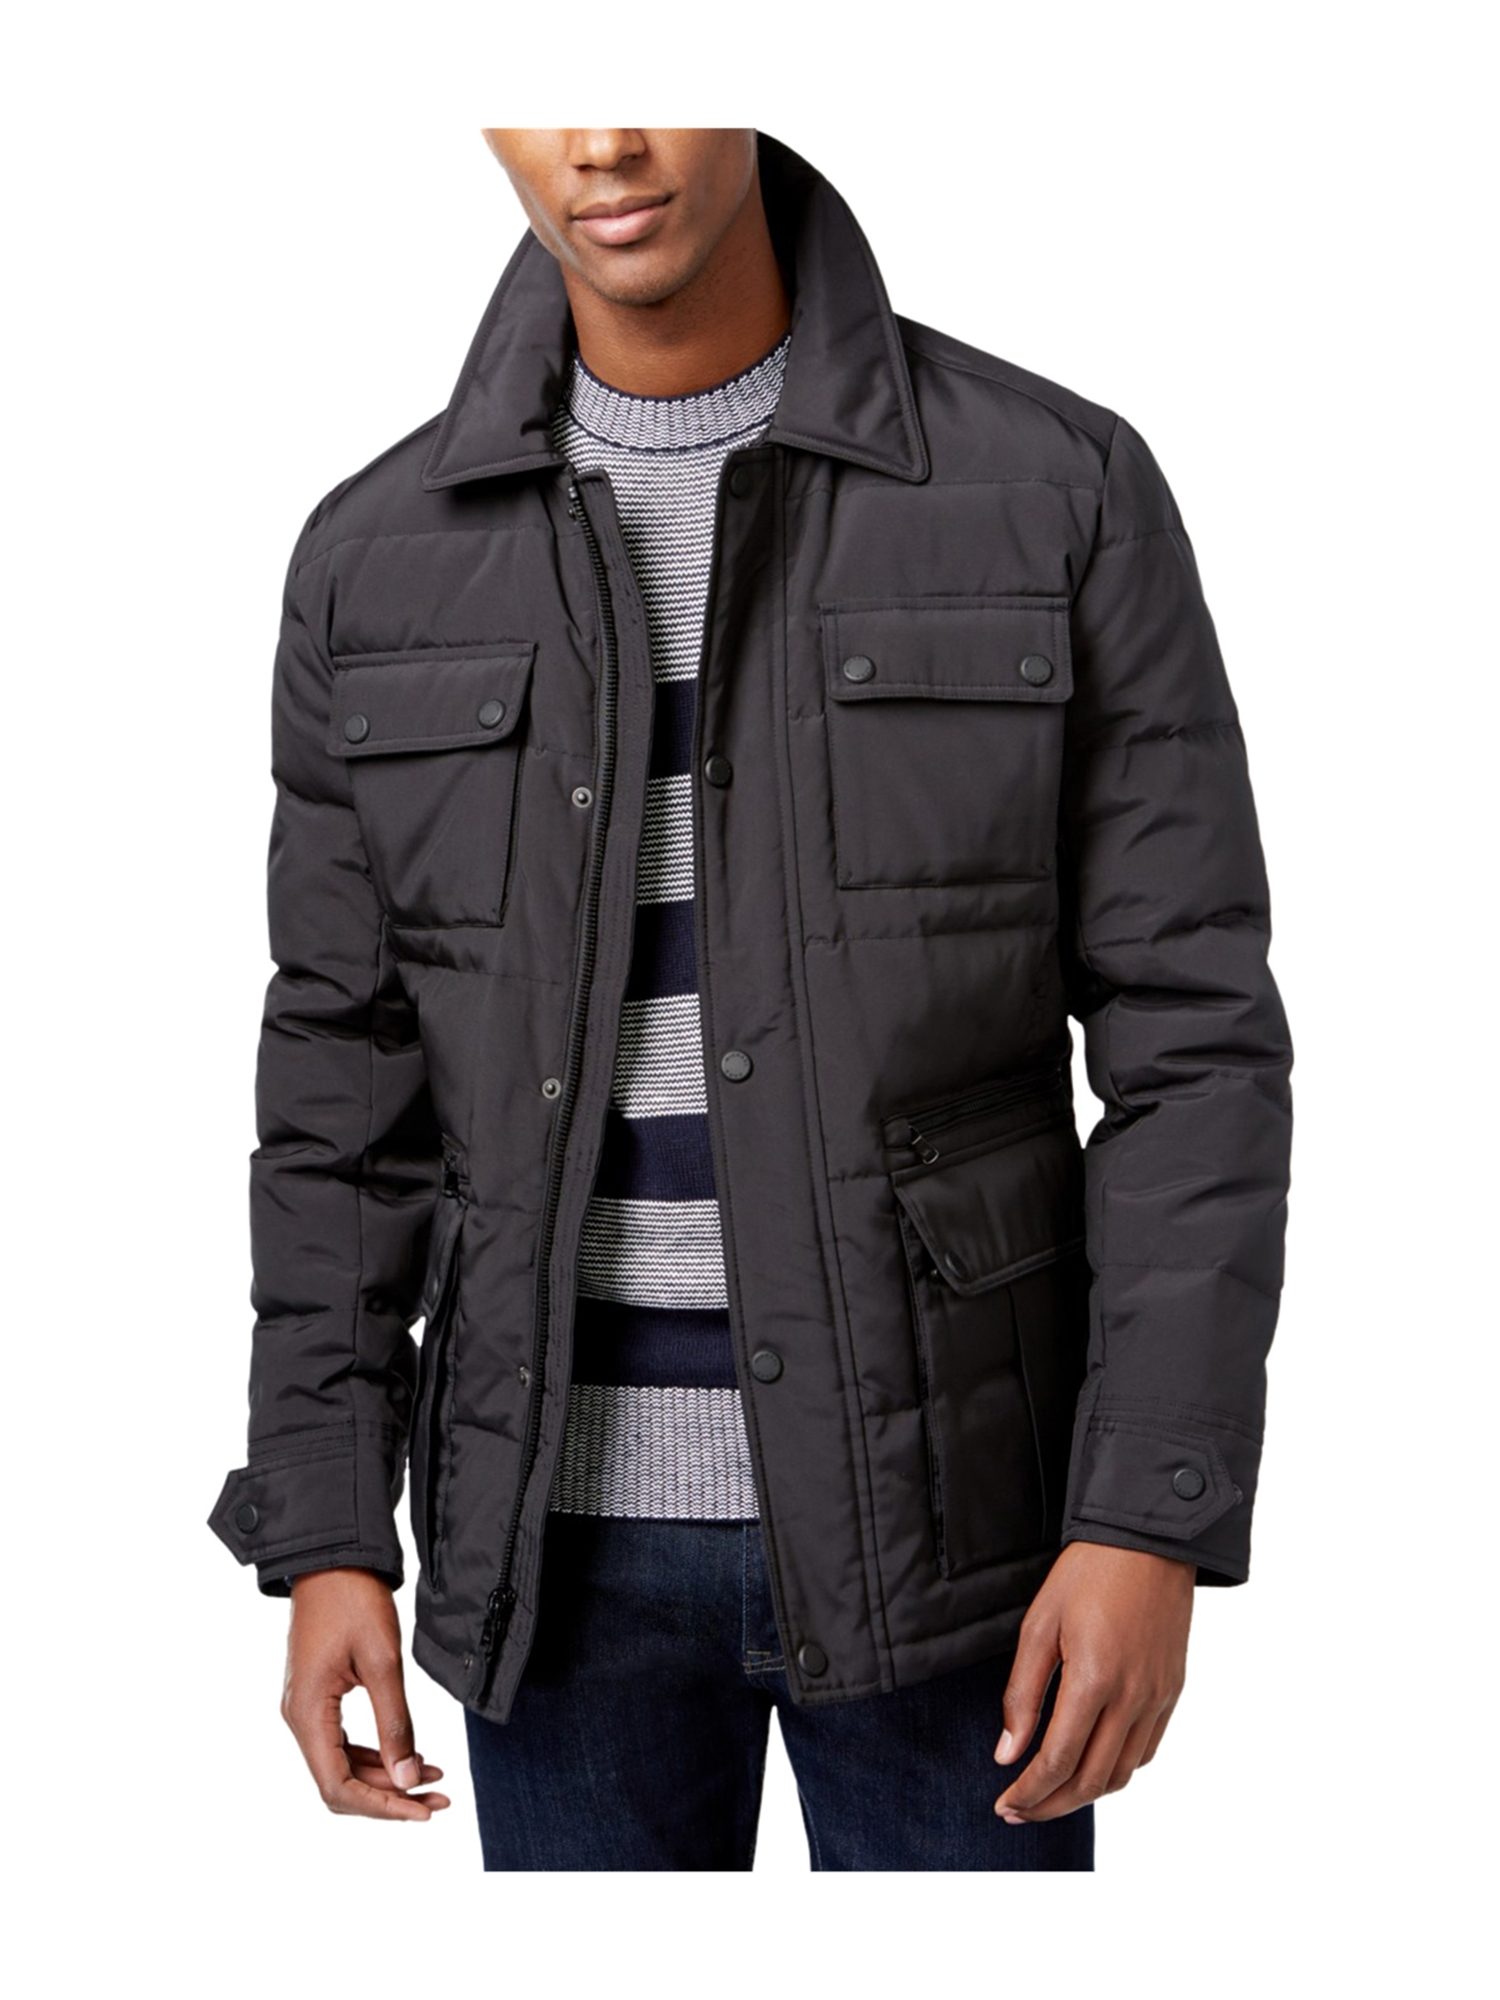 014dd934c Michael Kors Mens Linton Down Jacket